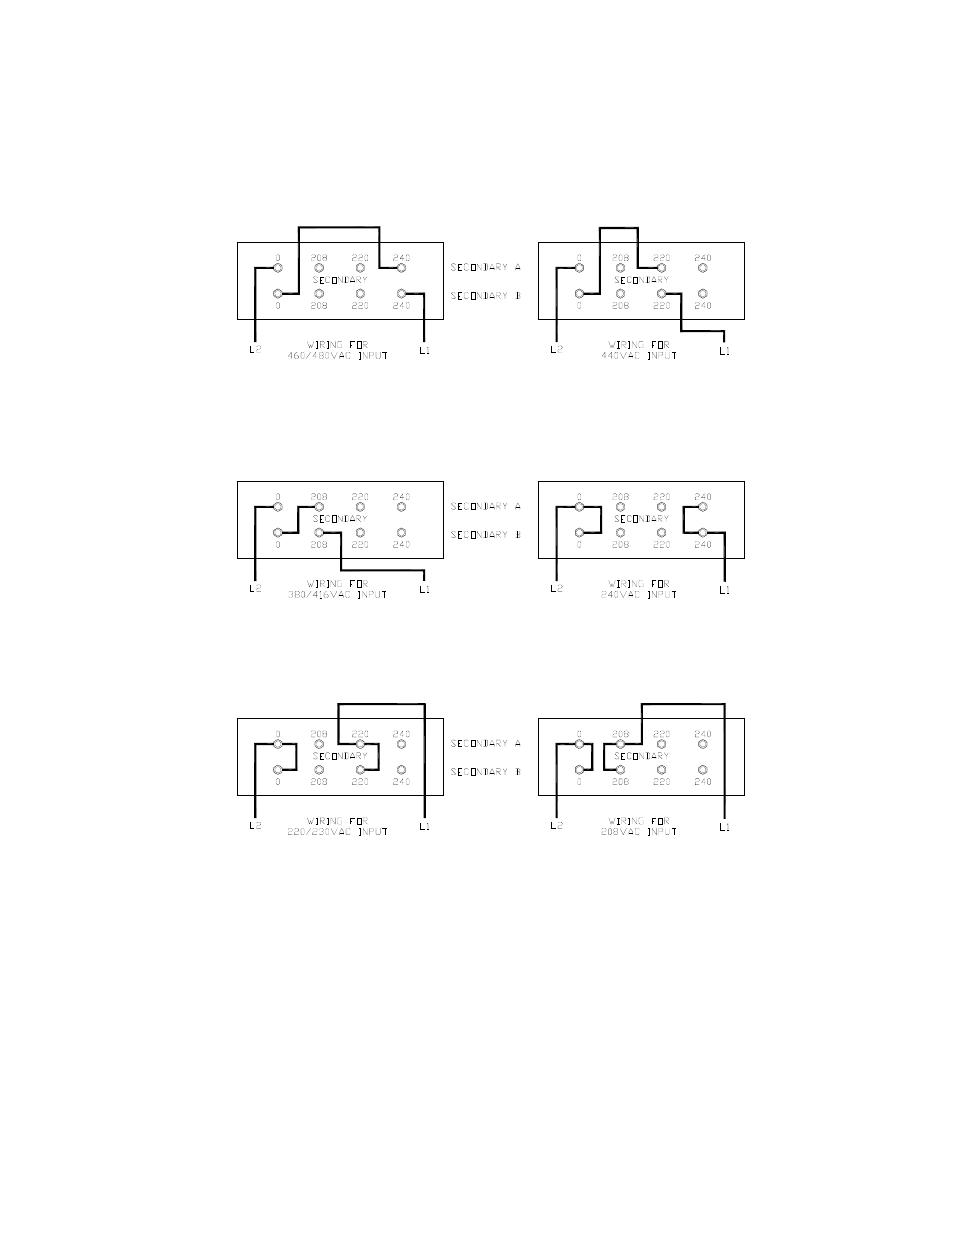 6 transformer wiring diagram, 6 transformer wiring diagram -3, Igure |  Walker Magnetics SMART-D SERIES User Manual | Page 12 / 42